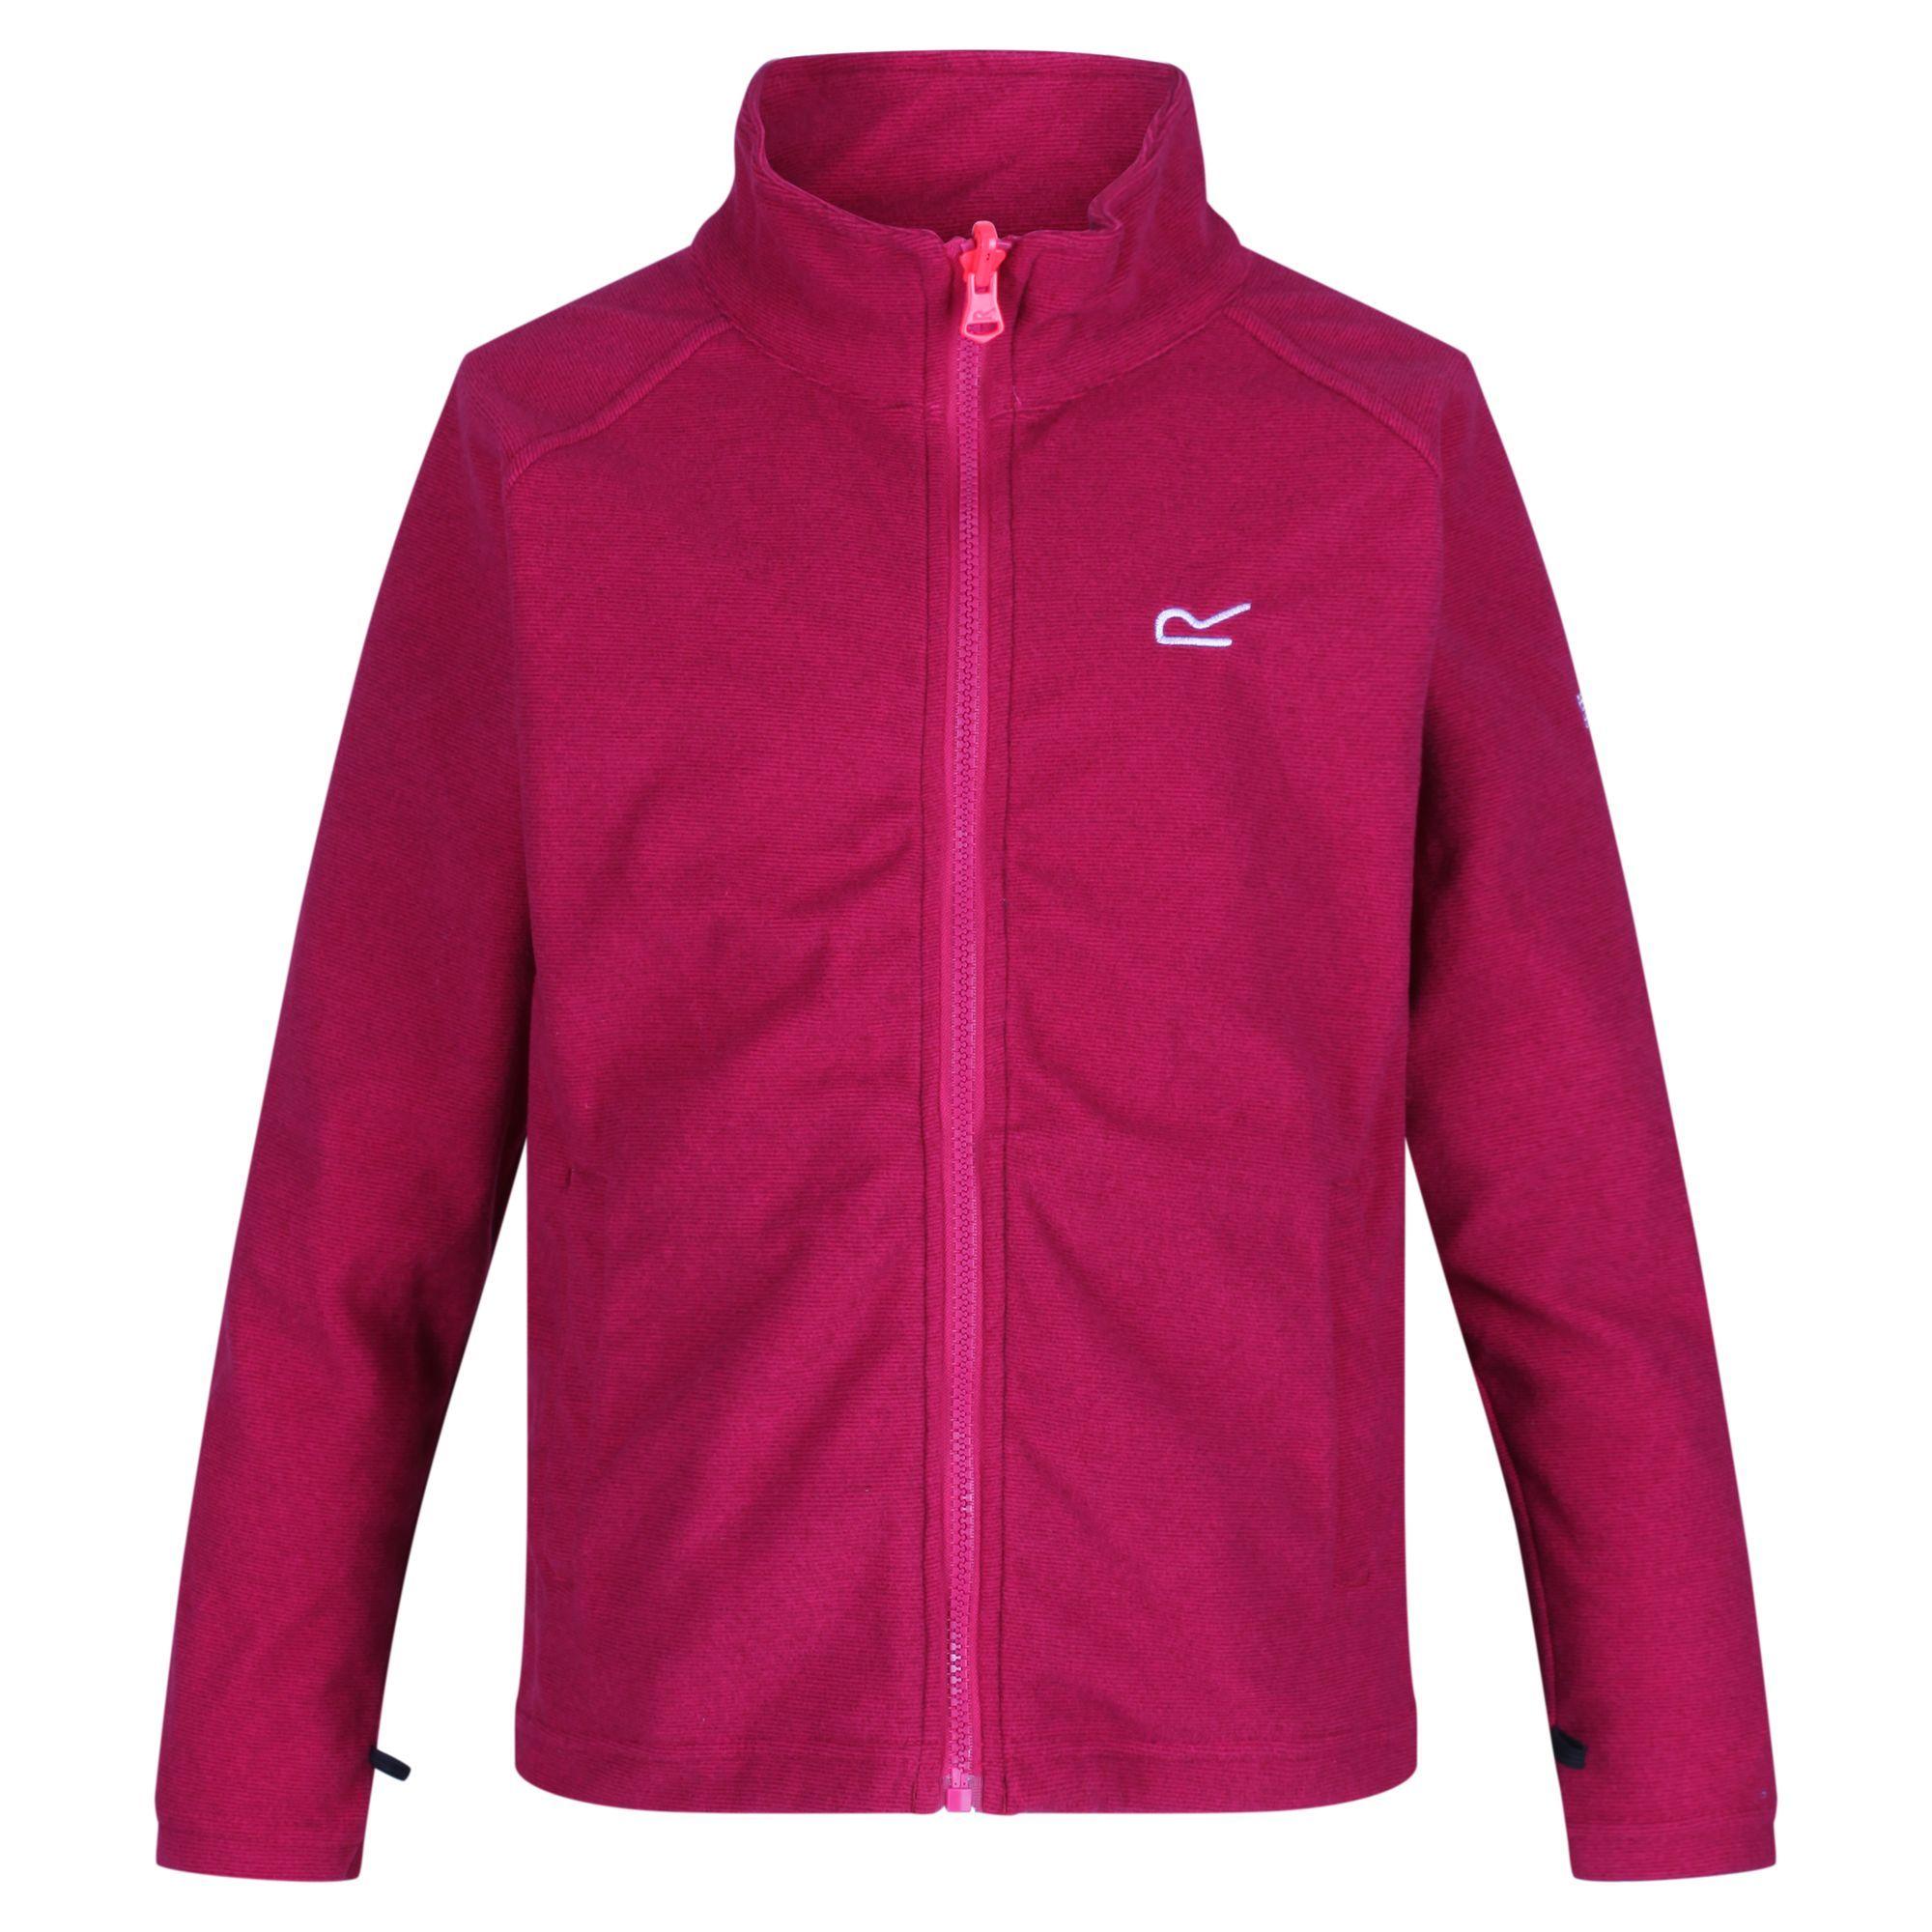 Regatta Childrens/Kids Hydrate IV Waterproof 3in1 Jacket